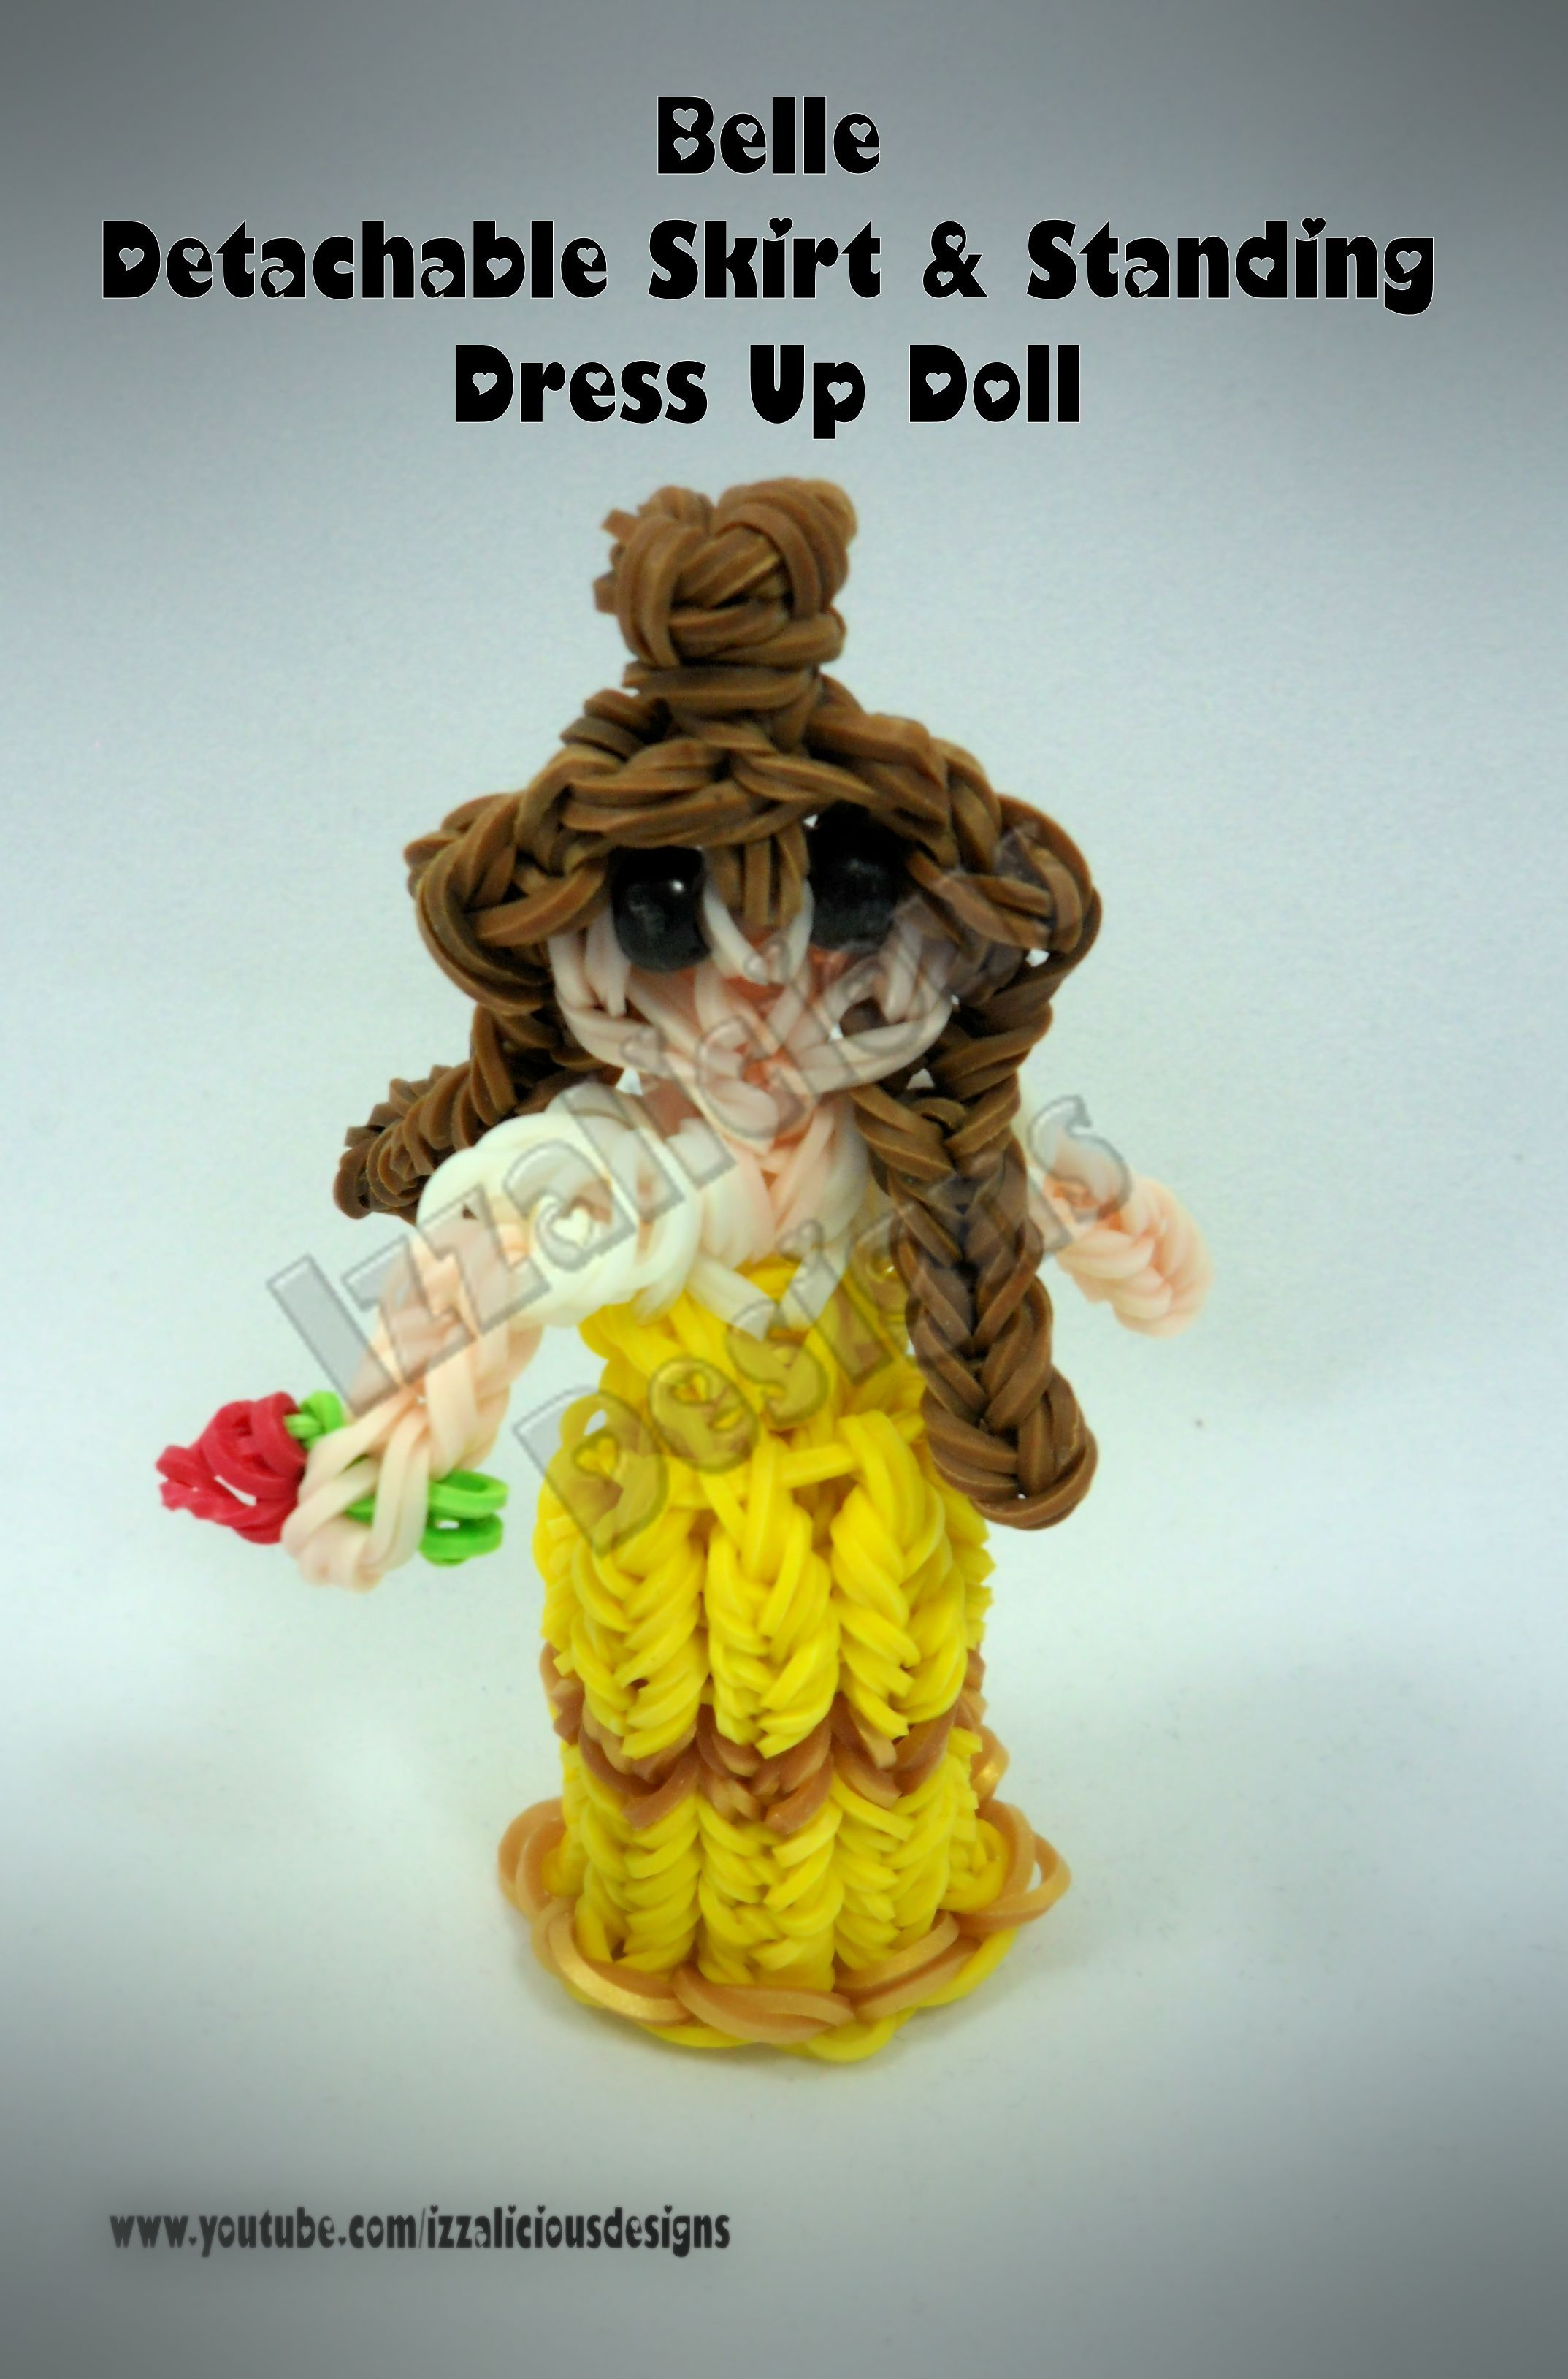 Rainbow Loom - Princess Series - Detachable & Standing Up 3D Skirts - Belle from Beauty & The Beast - Princesses using a single Rainbow Loom